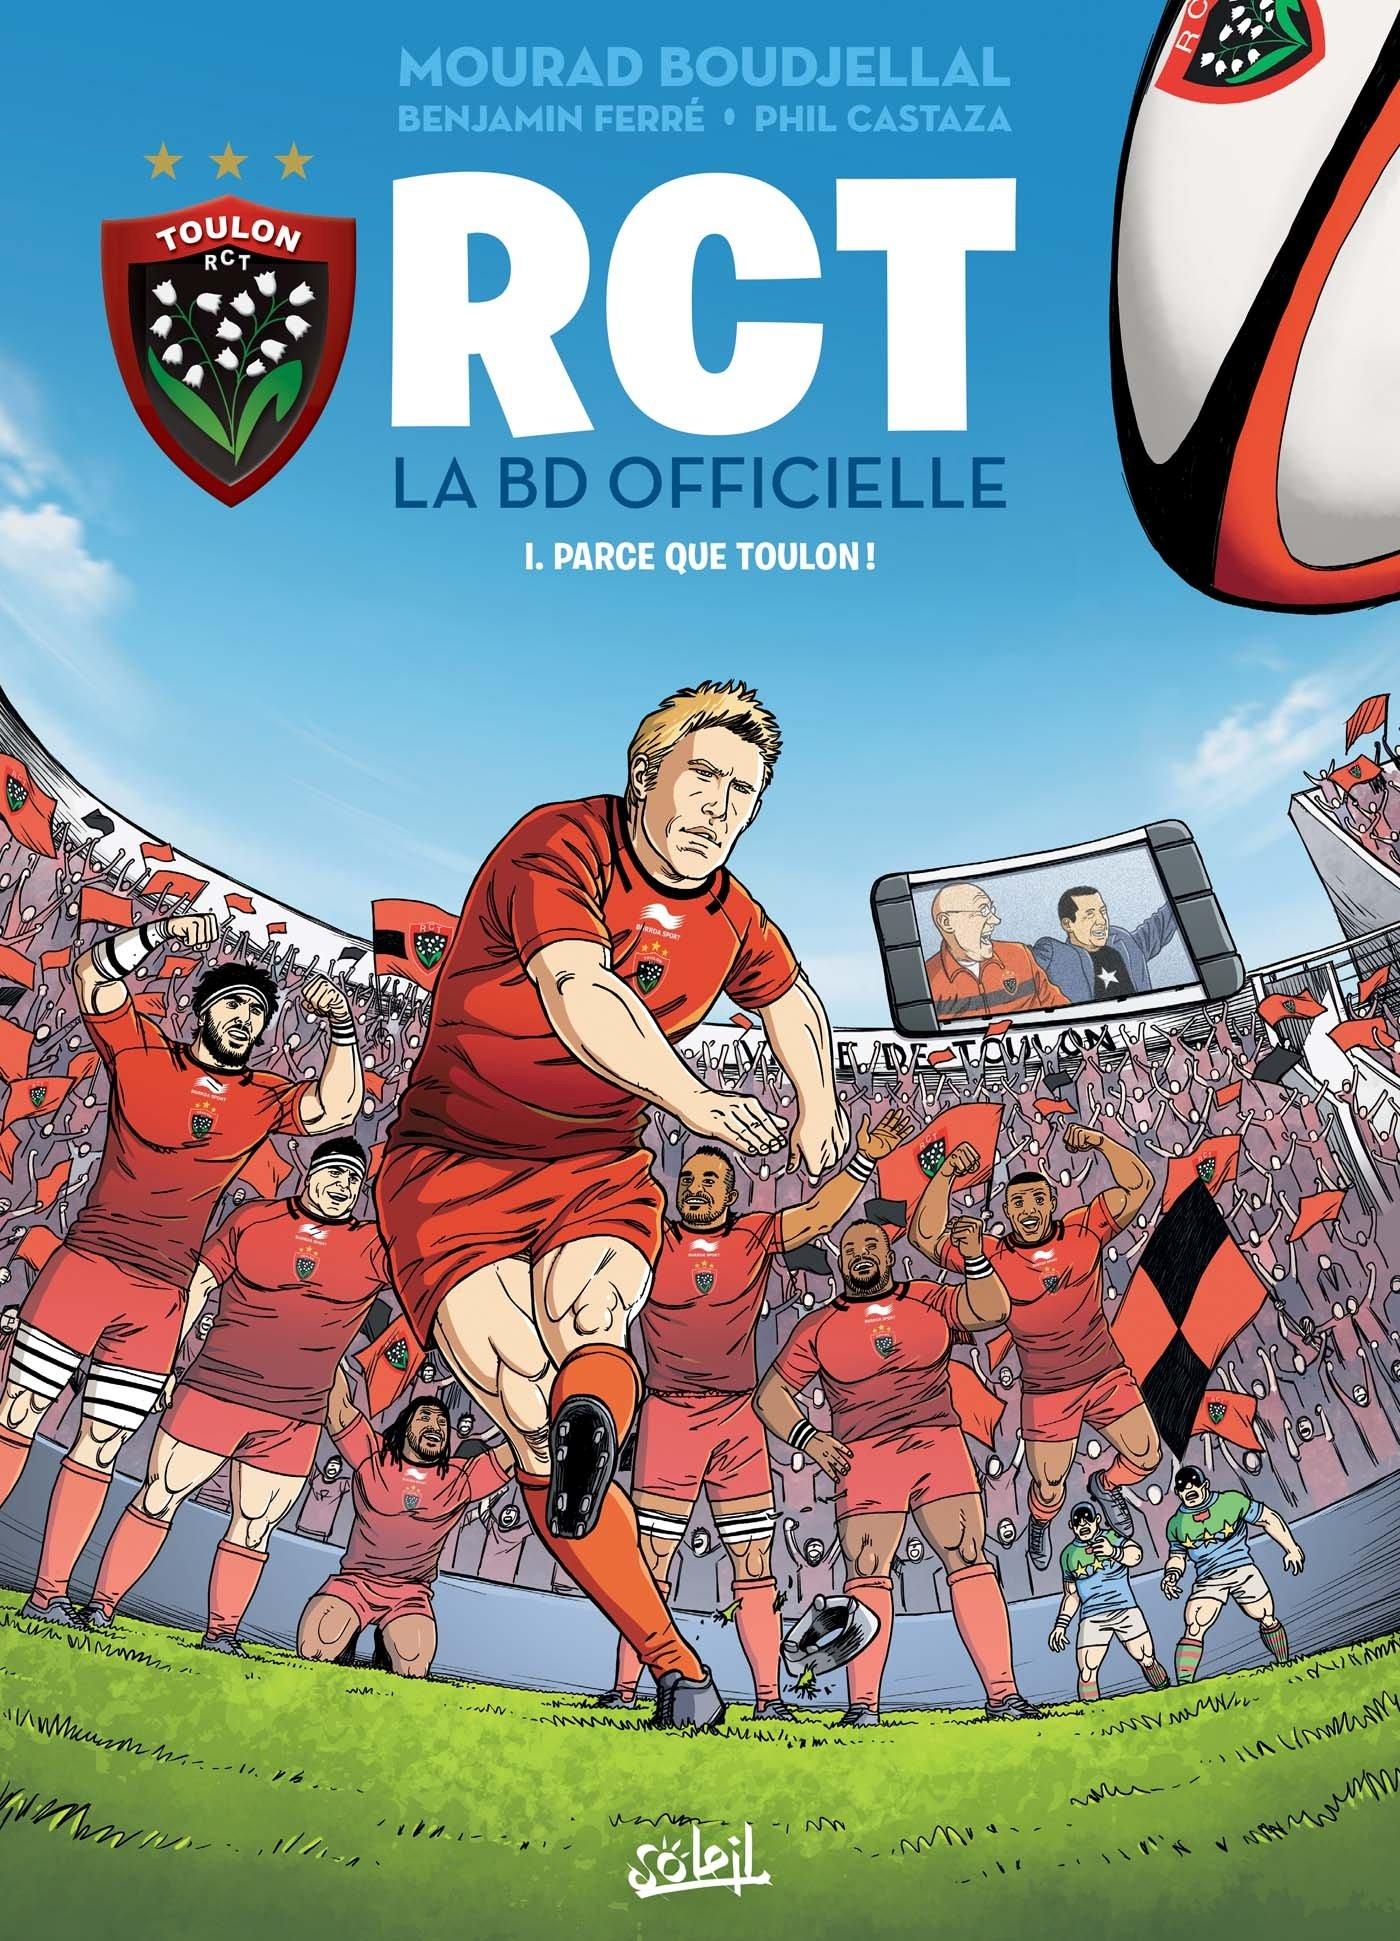 Amazon.fr - RCT 01: Parce que Toulon ! - Mourad Boudjellal, Benjamin Ferré,  Pascal Nino, Castaza - Livres